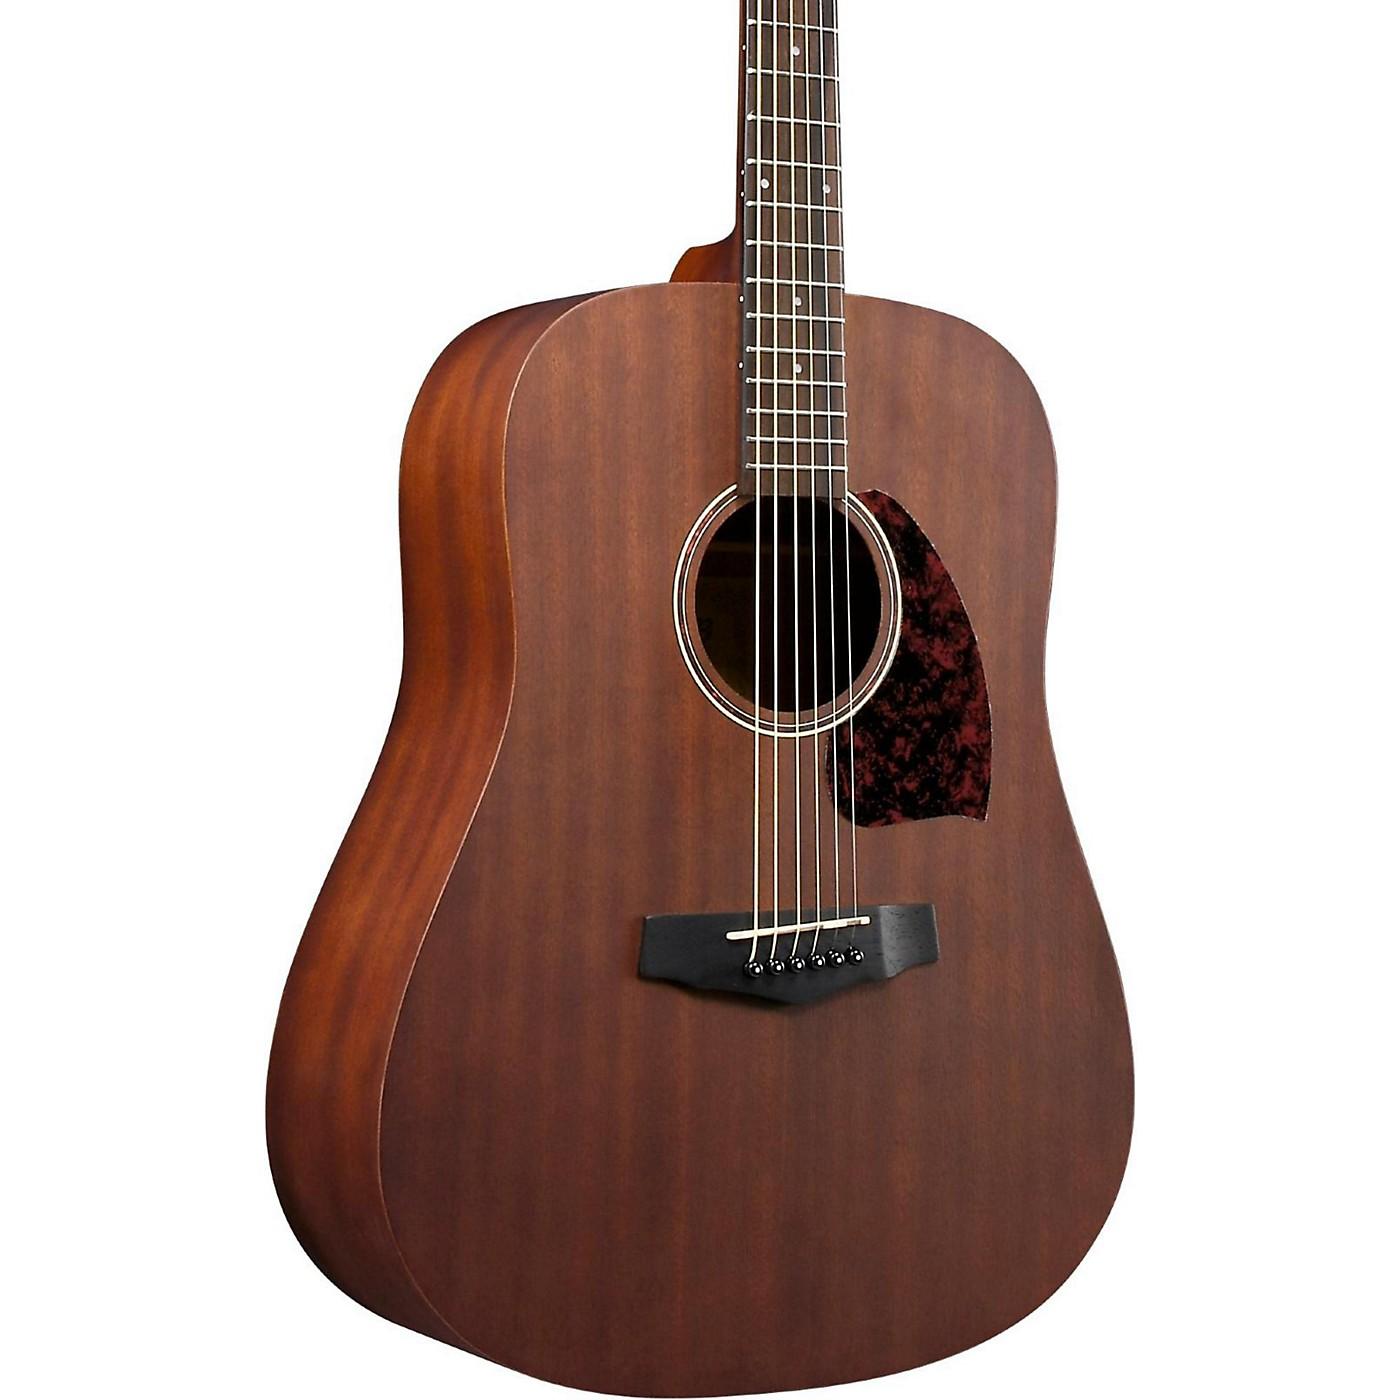 Ibanez PF12MH Dreadnought Acoustic Guitar thumbnail